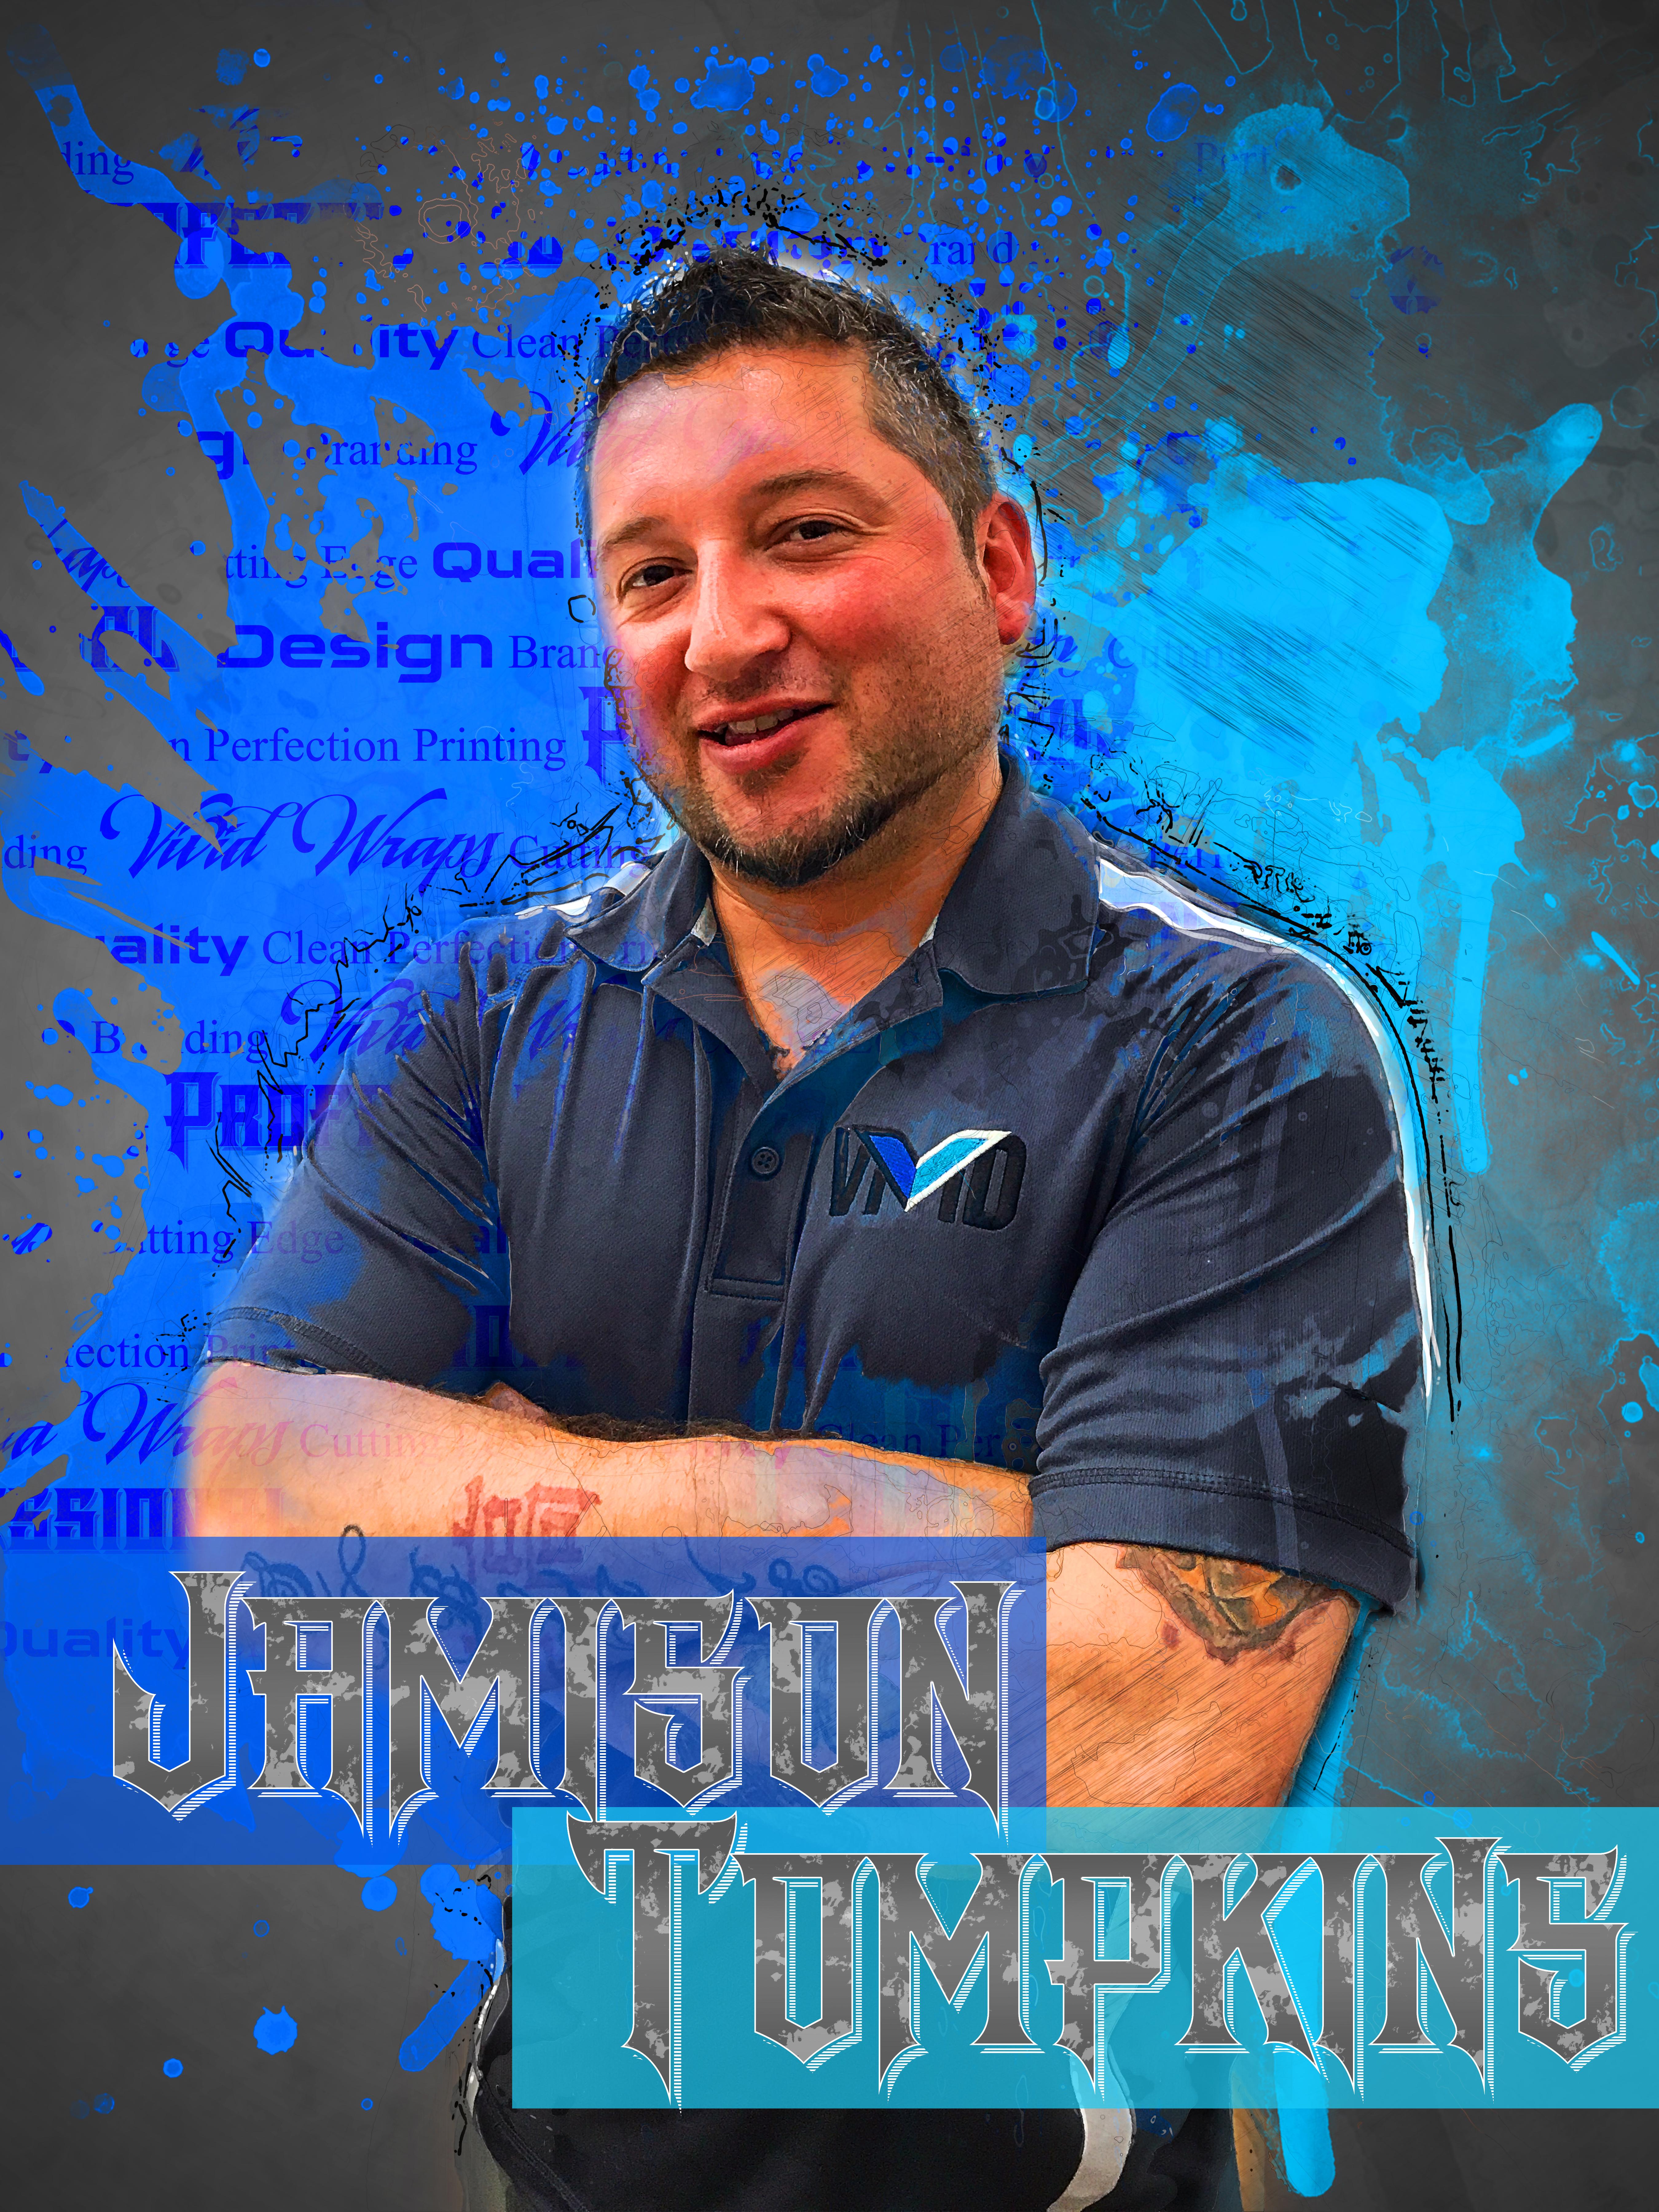 Jamison Tompkins